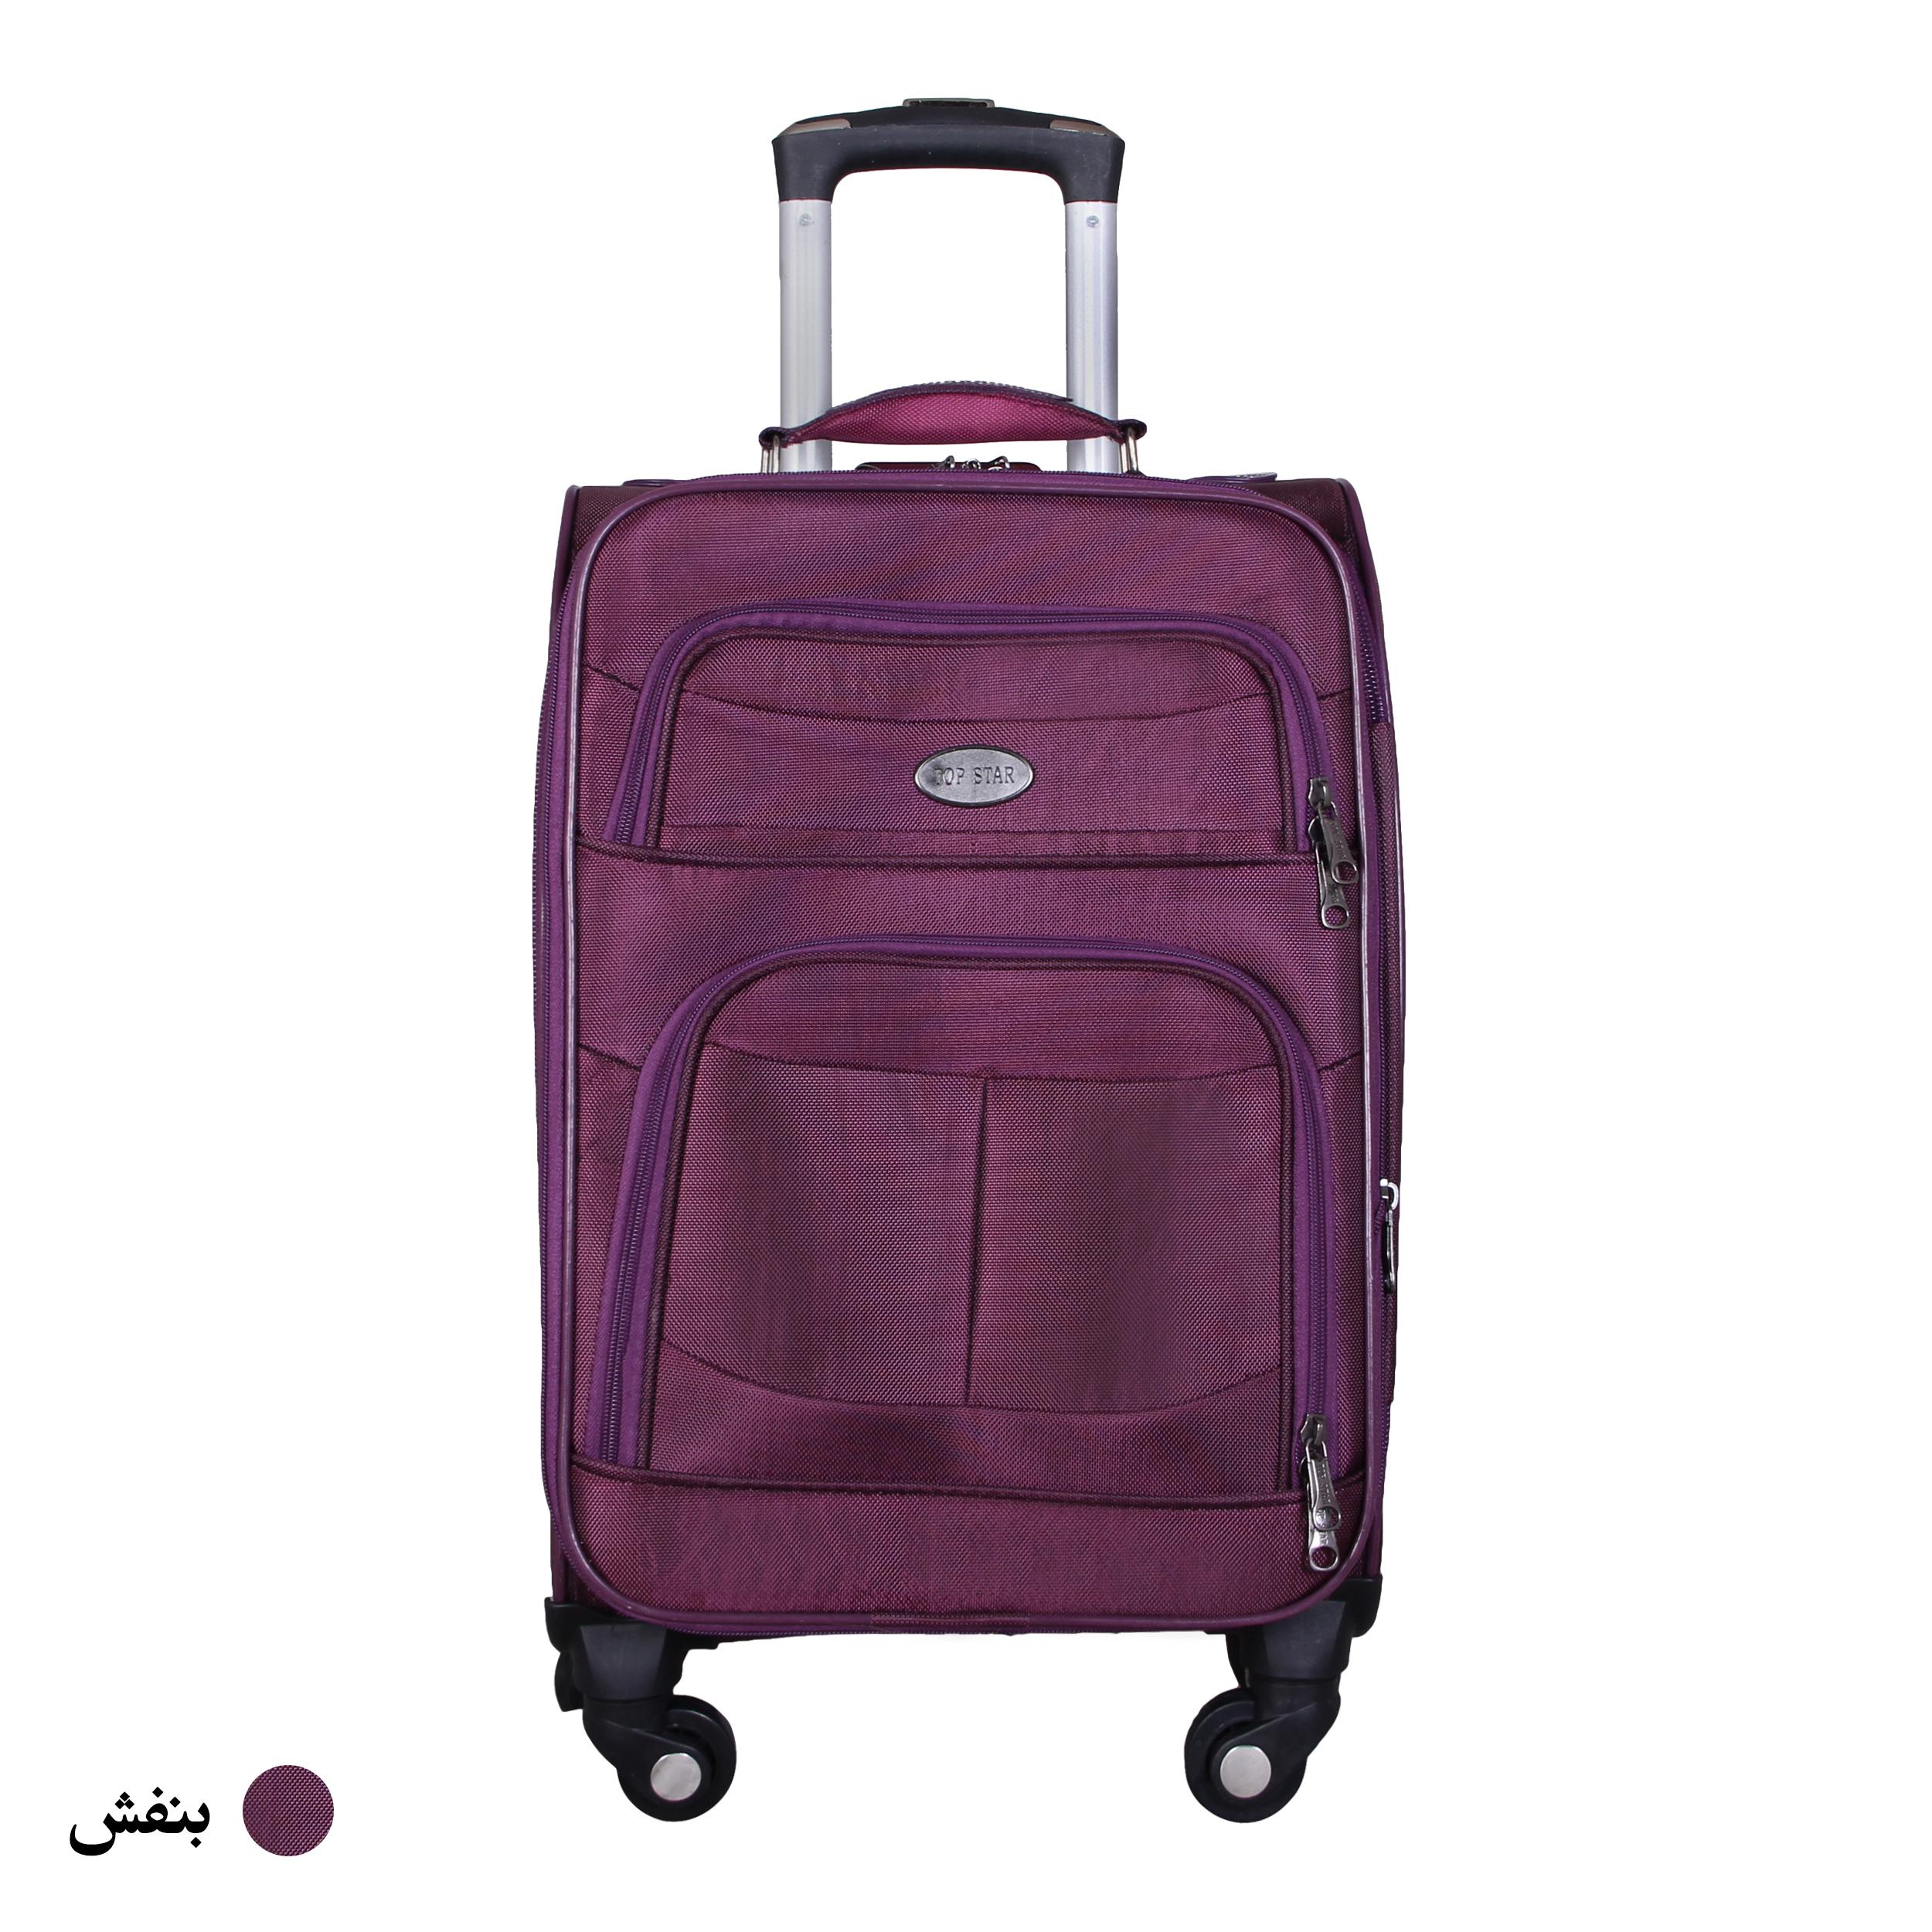 مجموعه سه عددی چمدان کدA1034 main 1 5